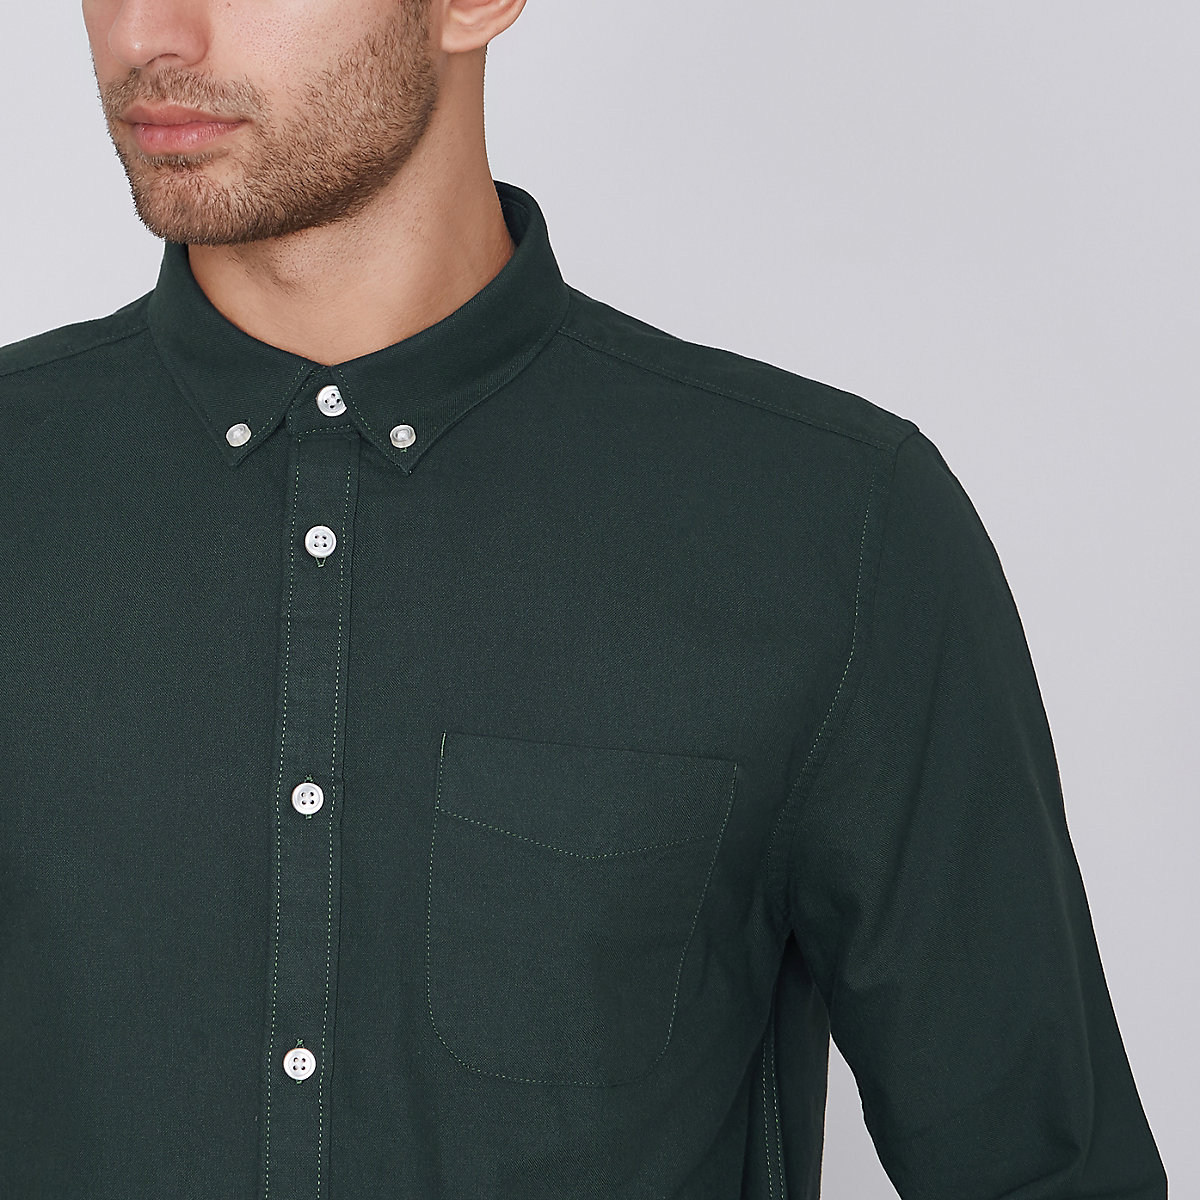 Green long sleeve oxford shirt